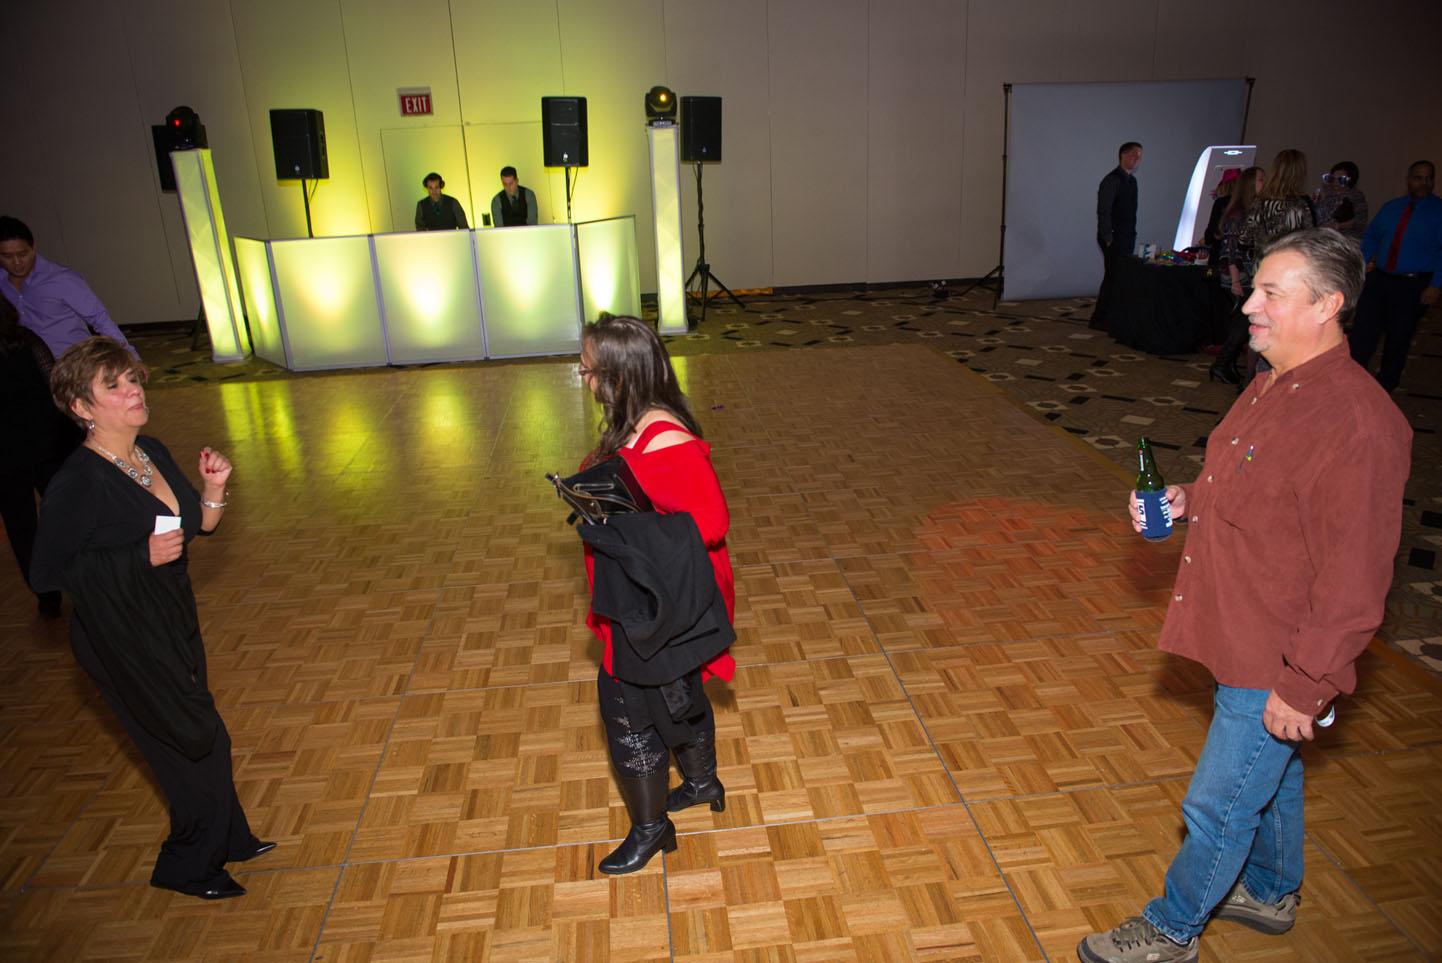 2015-12-09 ReMax Corpoarte Event - The Borgata - Atlantic City NJ - Photo Sesh - 2015-5082.jpg